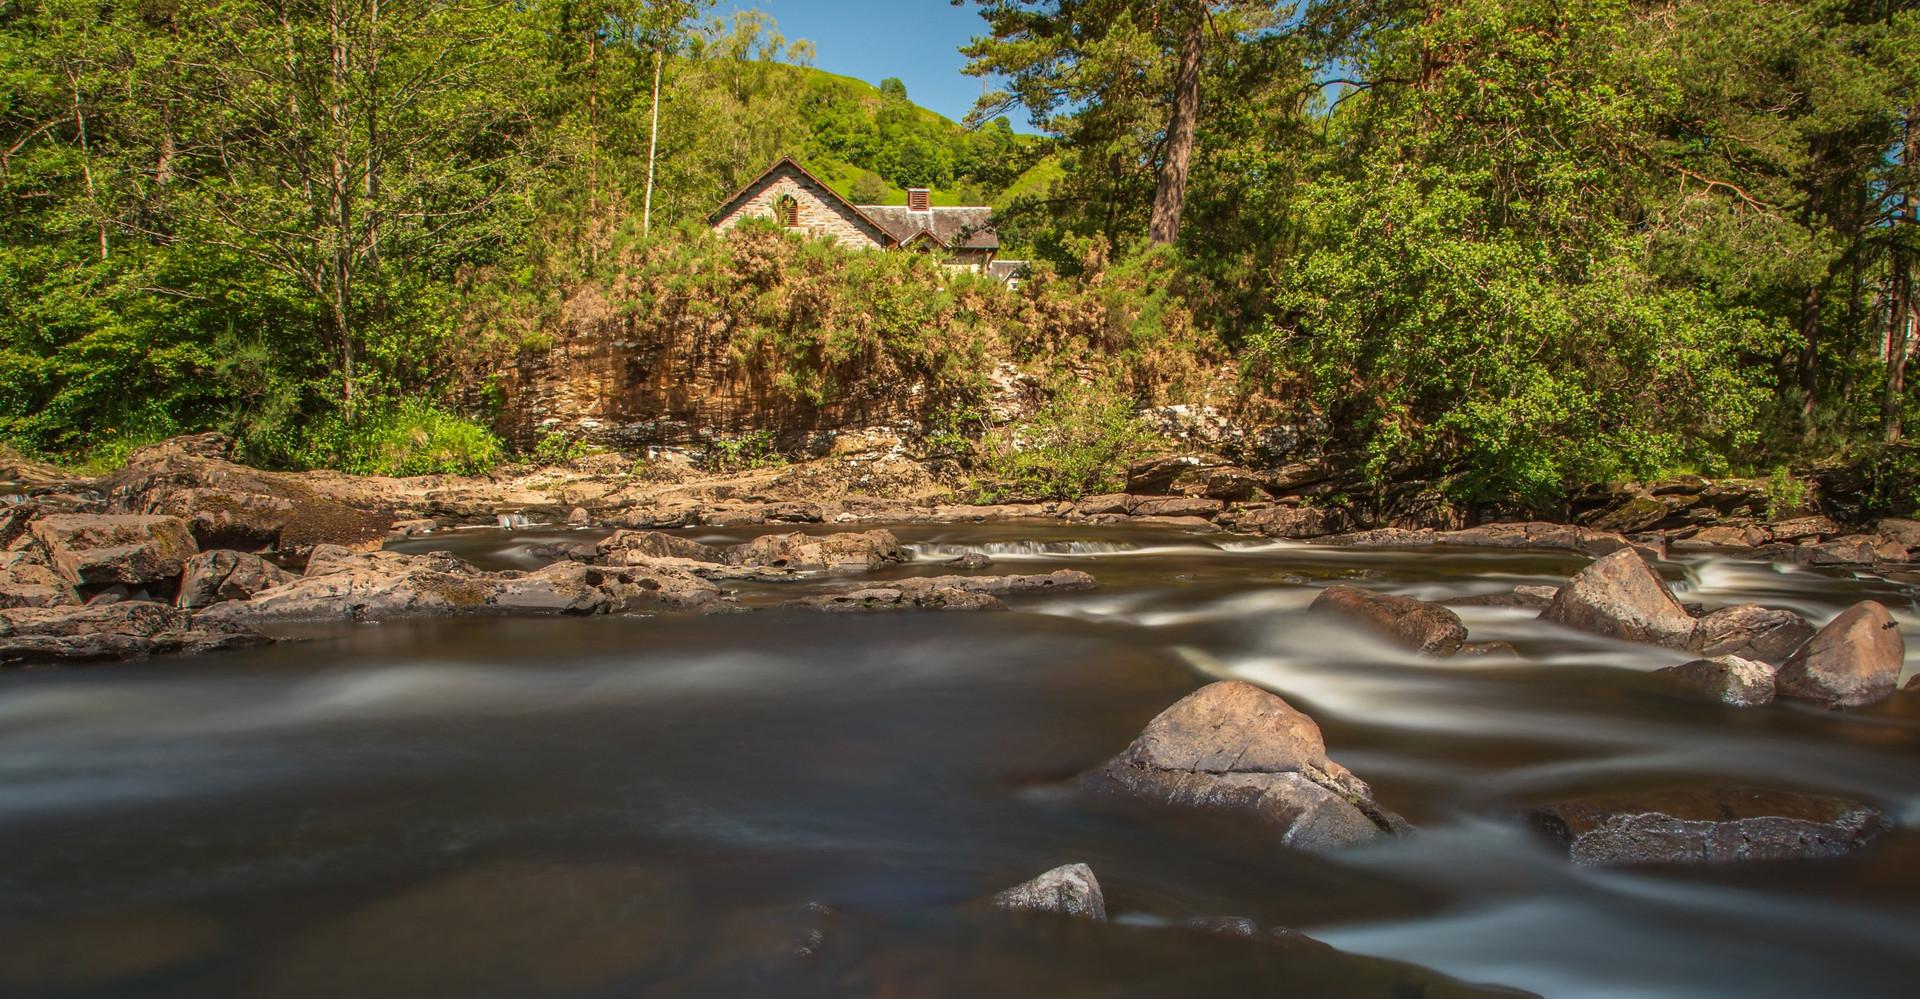 River Tummel, Perthshire